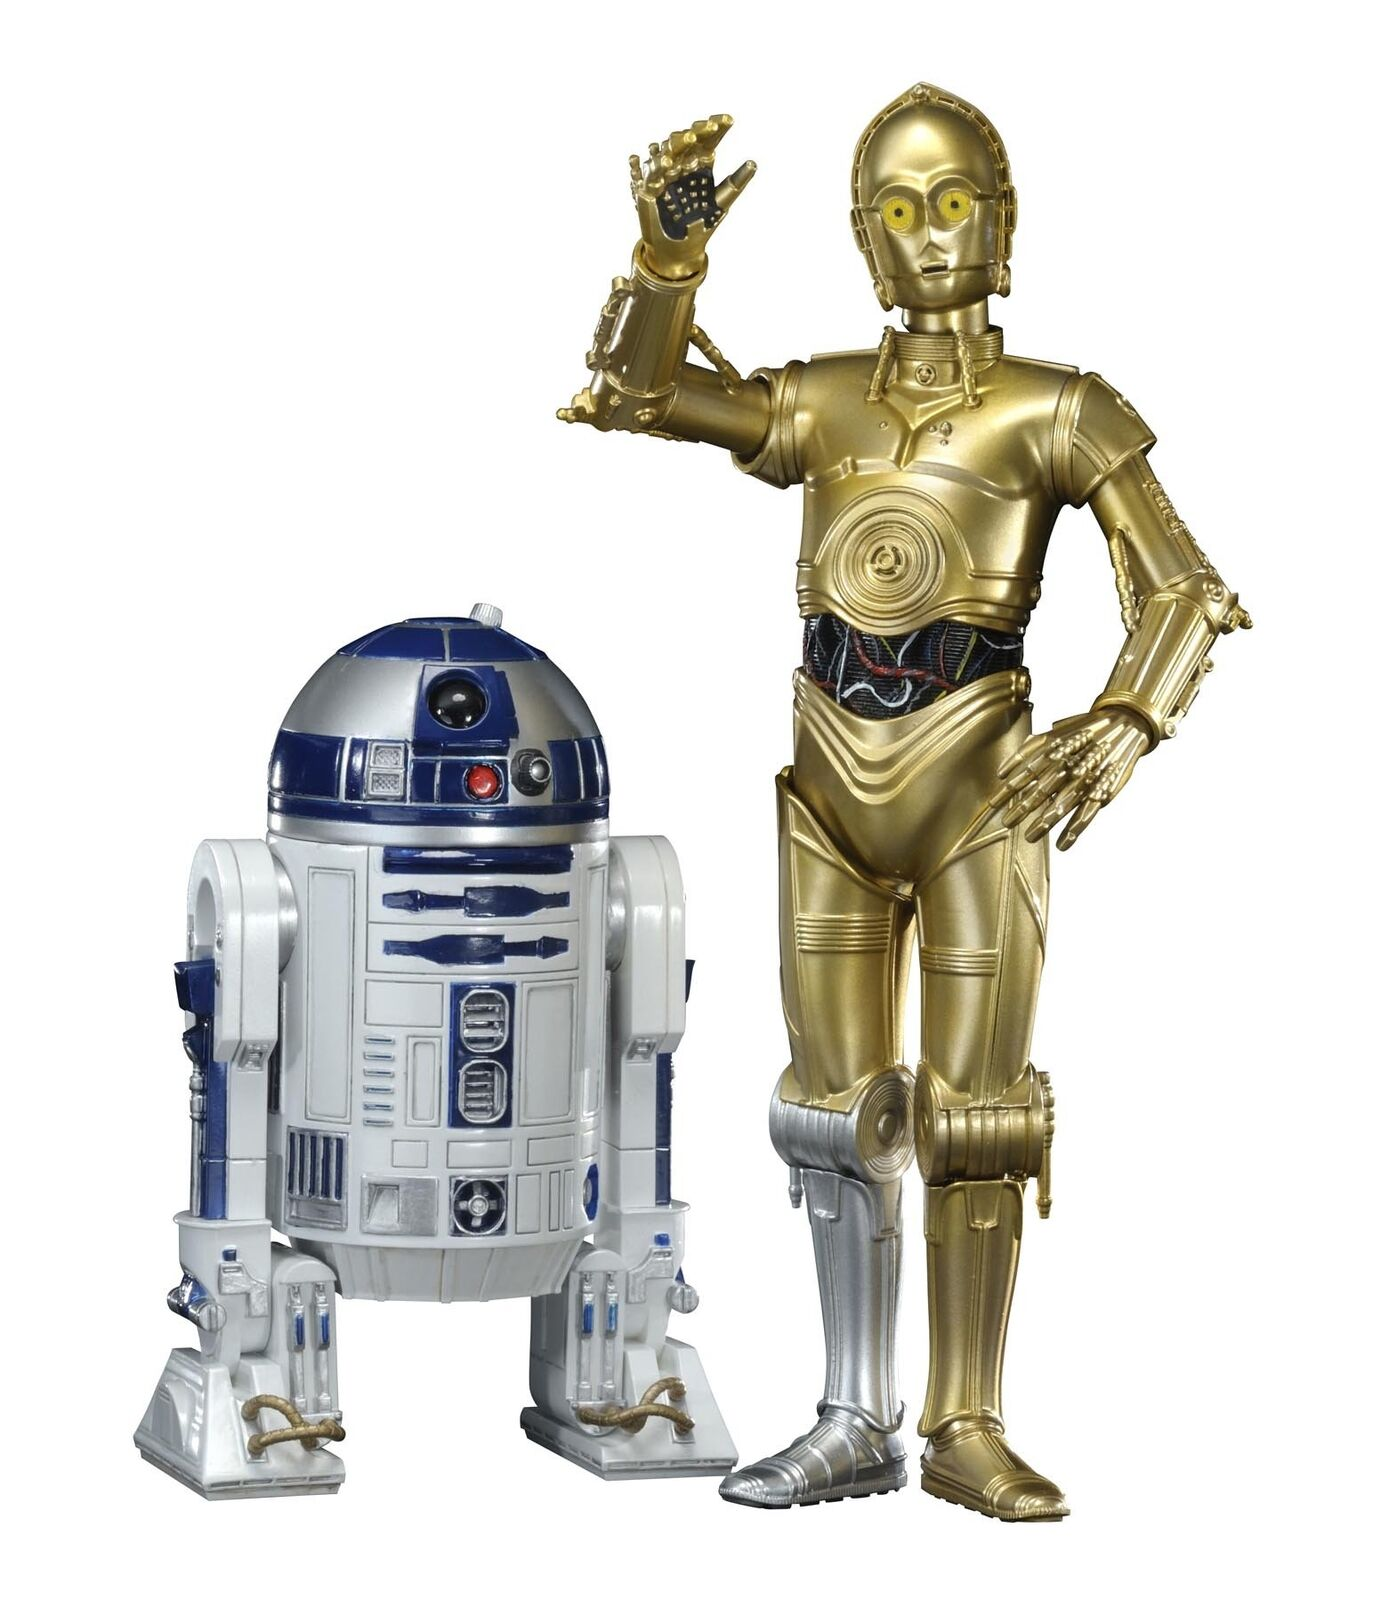 Star Wars ARTFX+ R2-D2 & C-3PO Kotobukiya (1/10 scale PVC figure) ARTFX